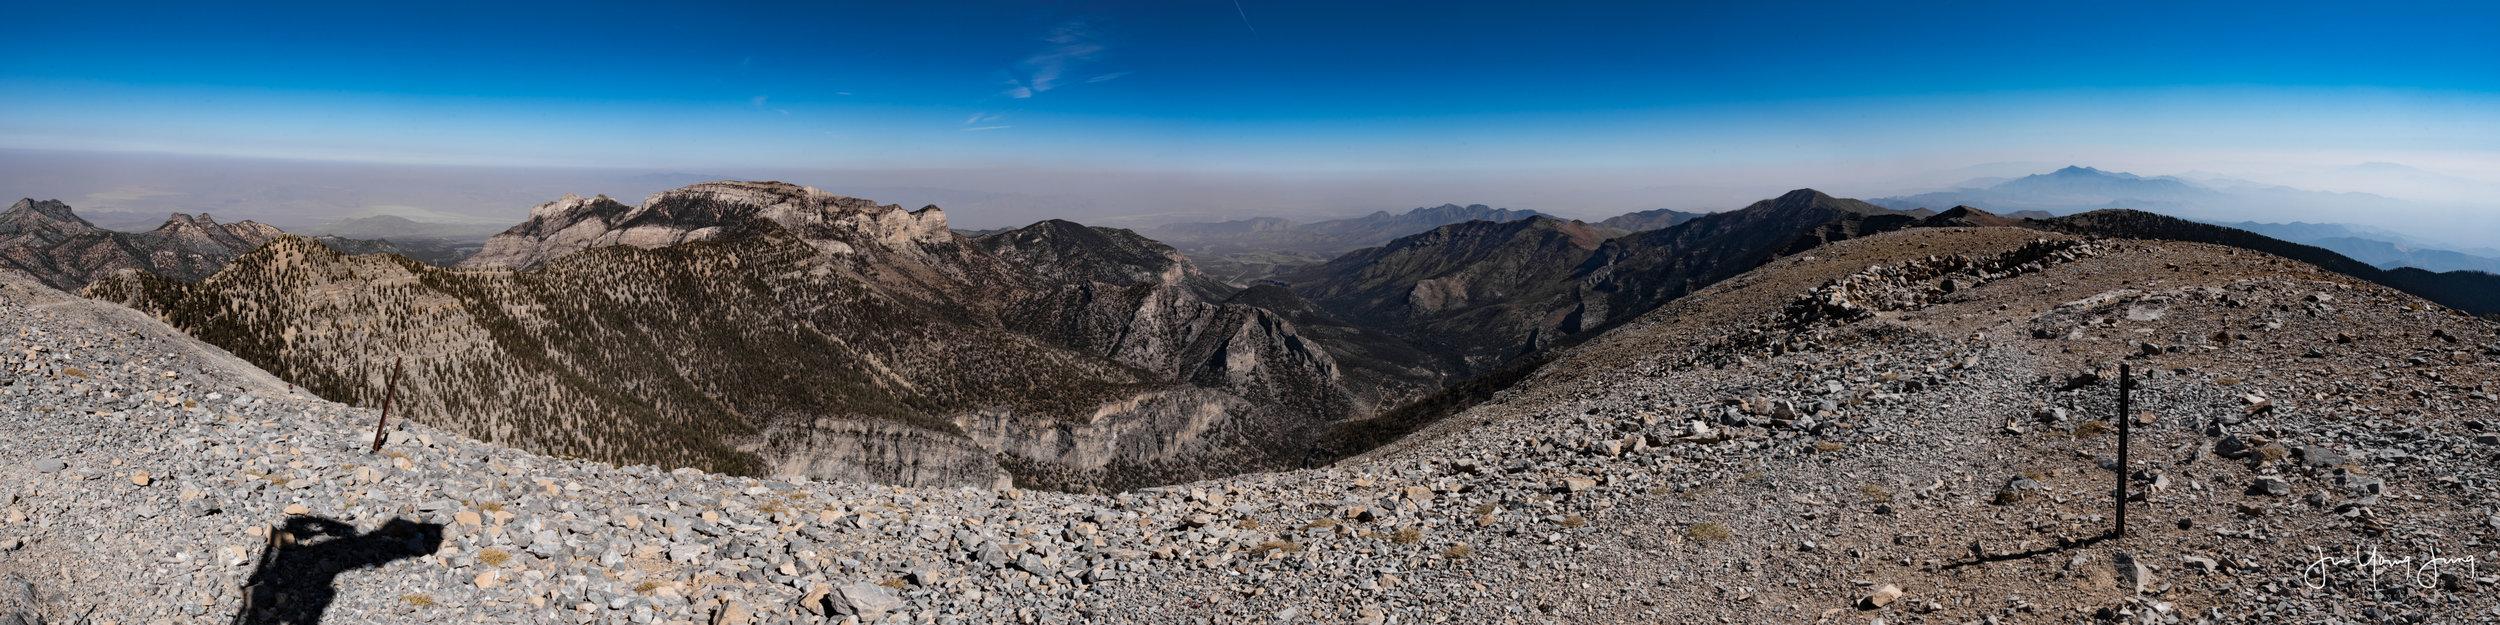 East View from Mt. Charleston Peak